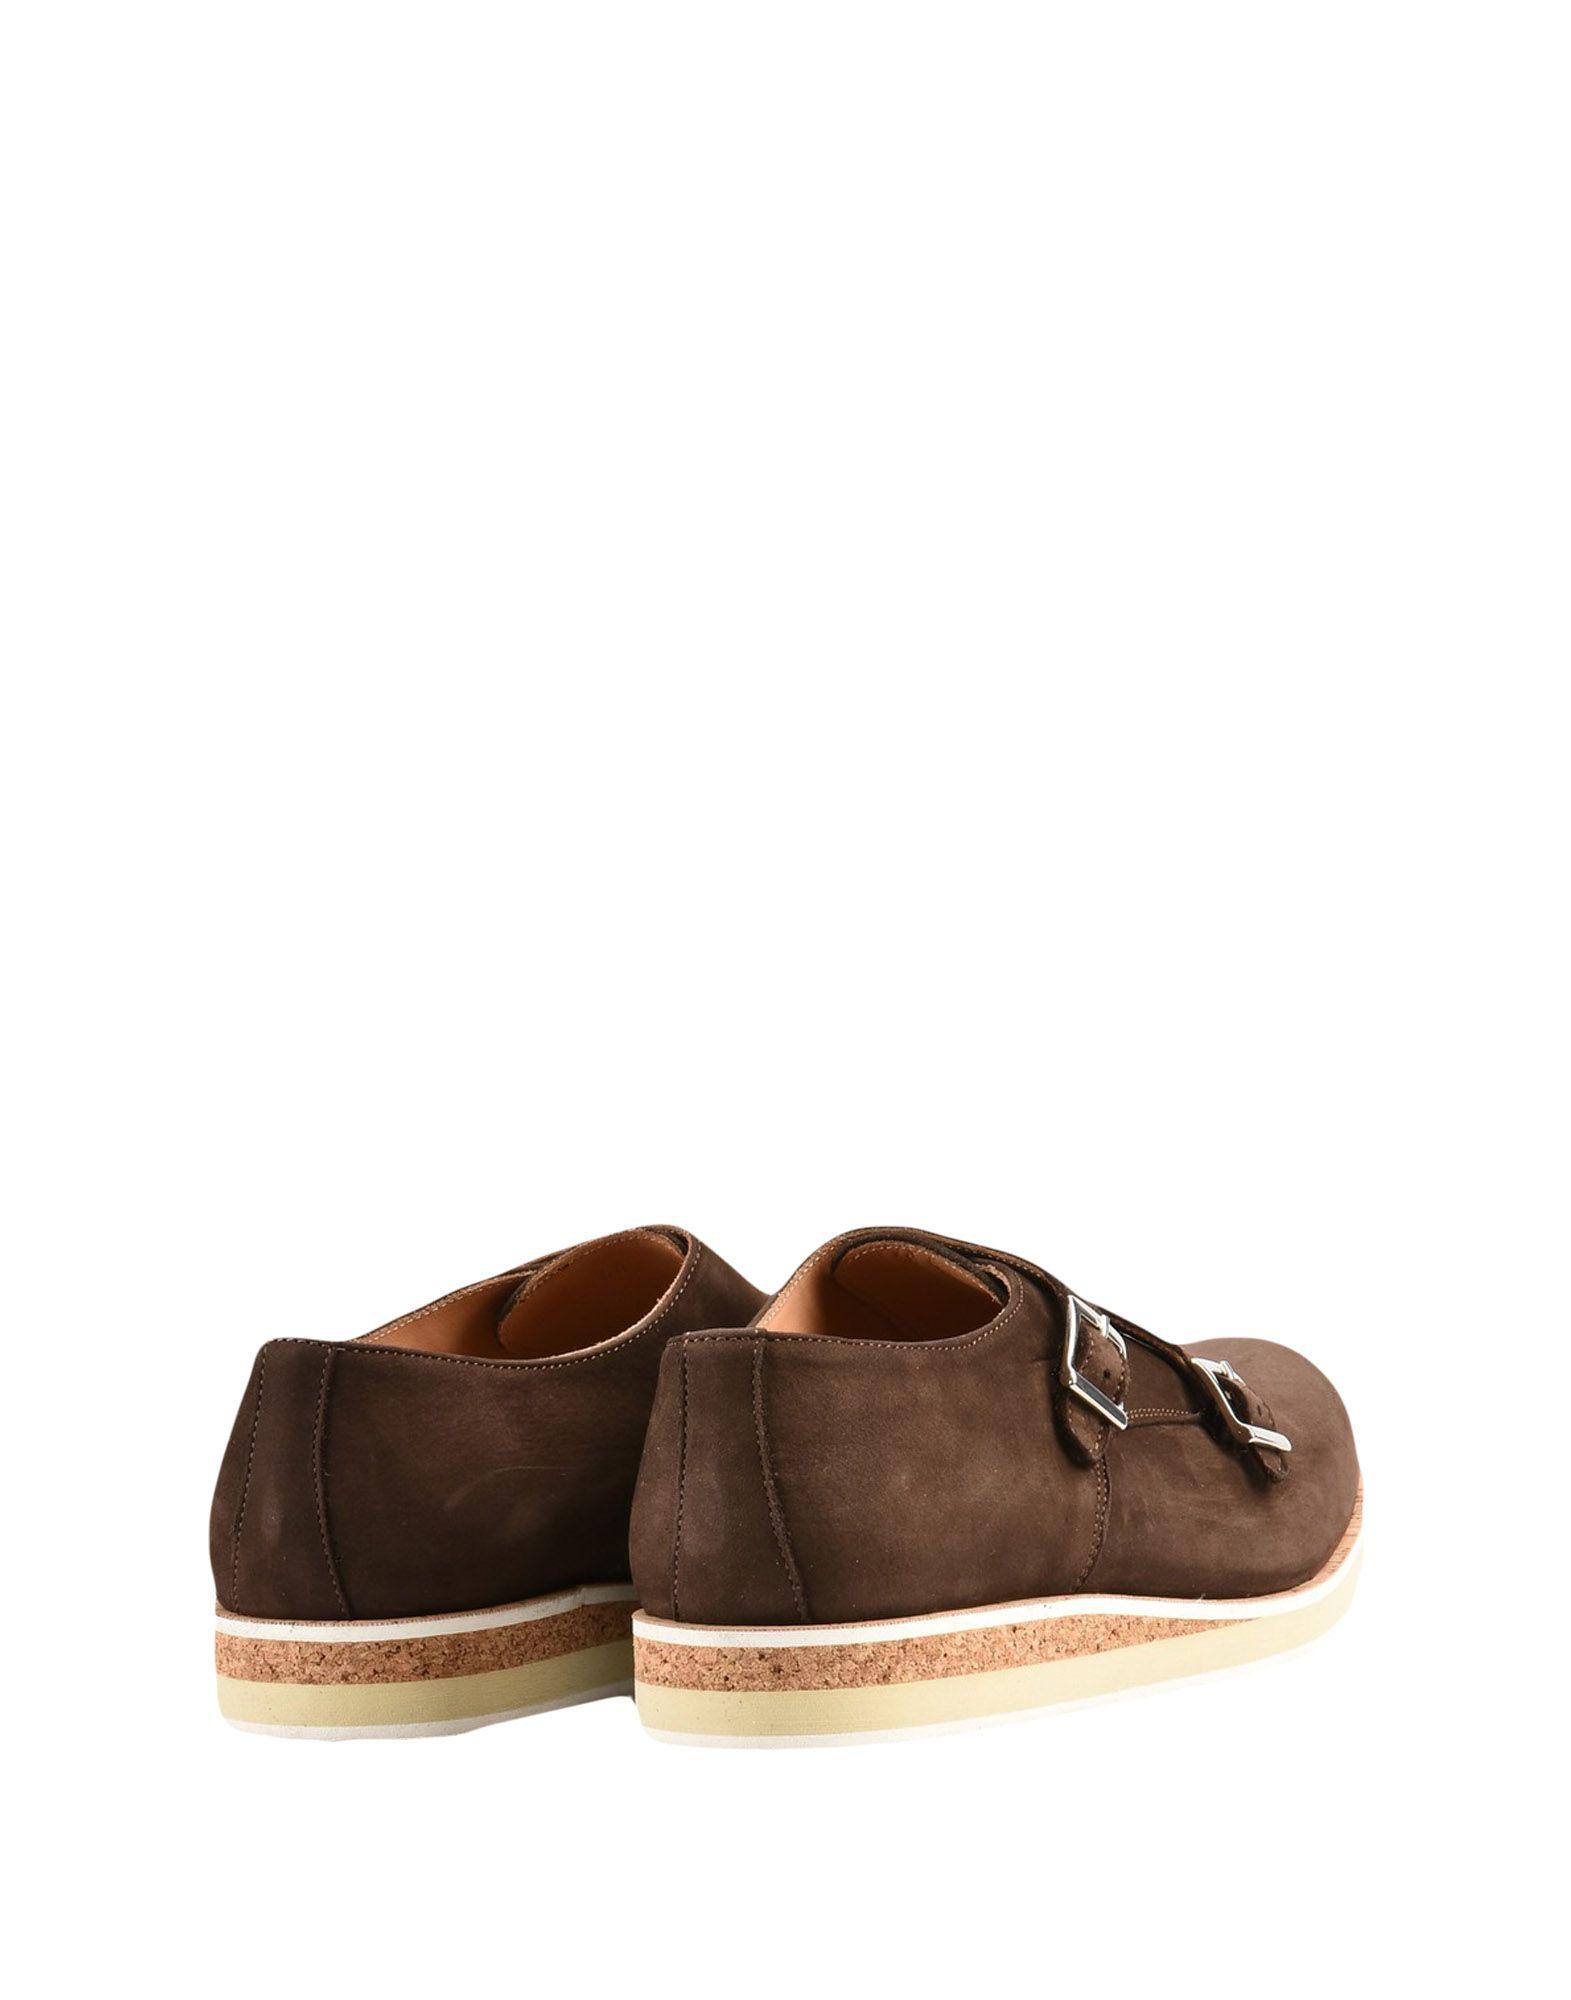 Rabatt echte Schuhe Pierre Darré Mokassins Herren  11214161TL